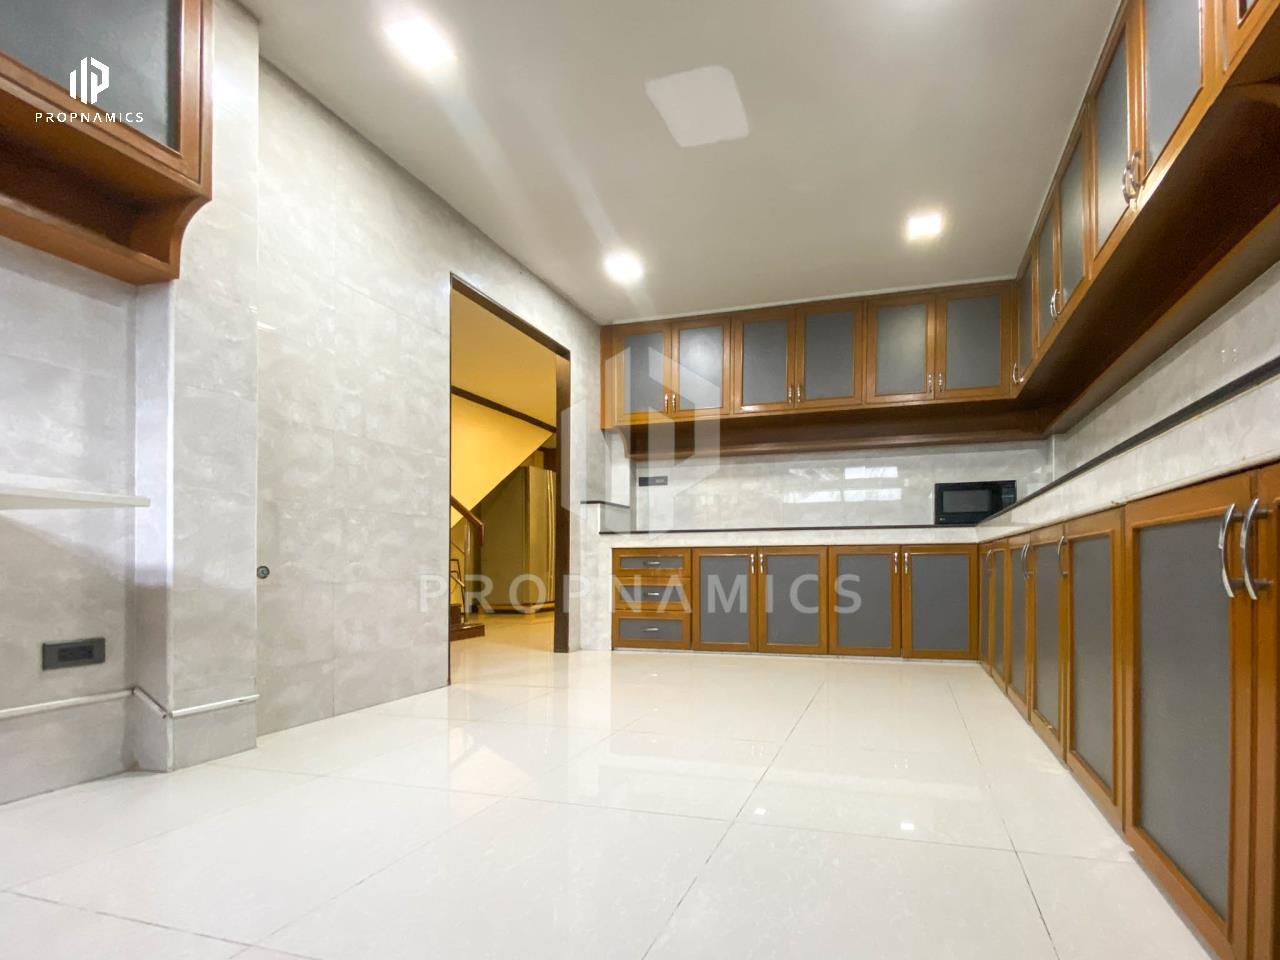 Propnamics Co., Ltd Agency's FOR RENT: SINGLE HOUSE IN SUKHUMVIT 26 8